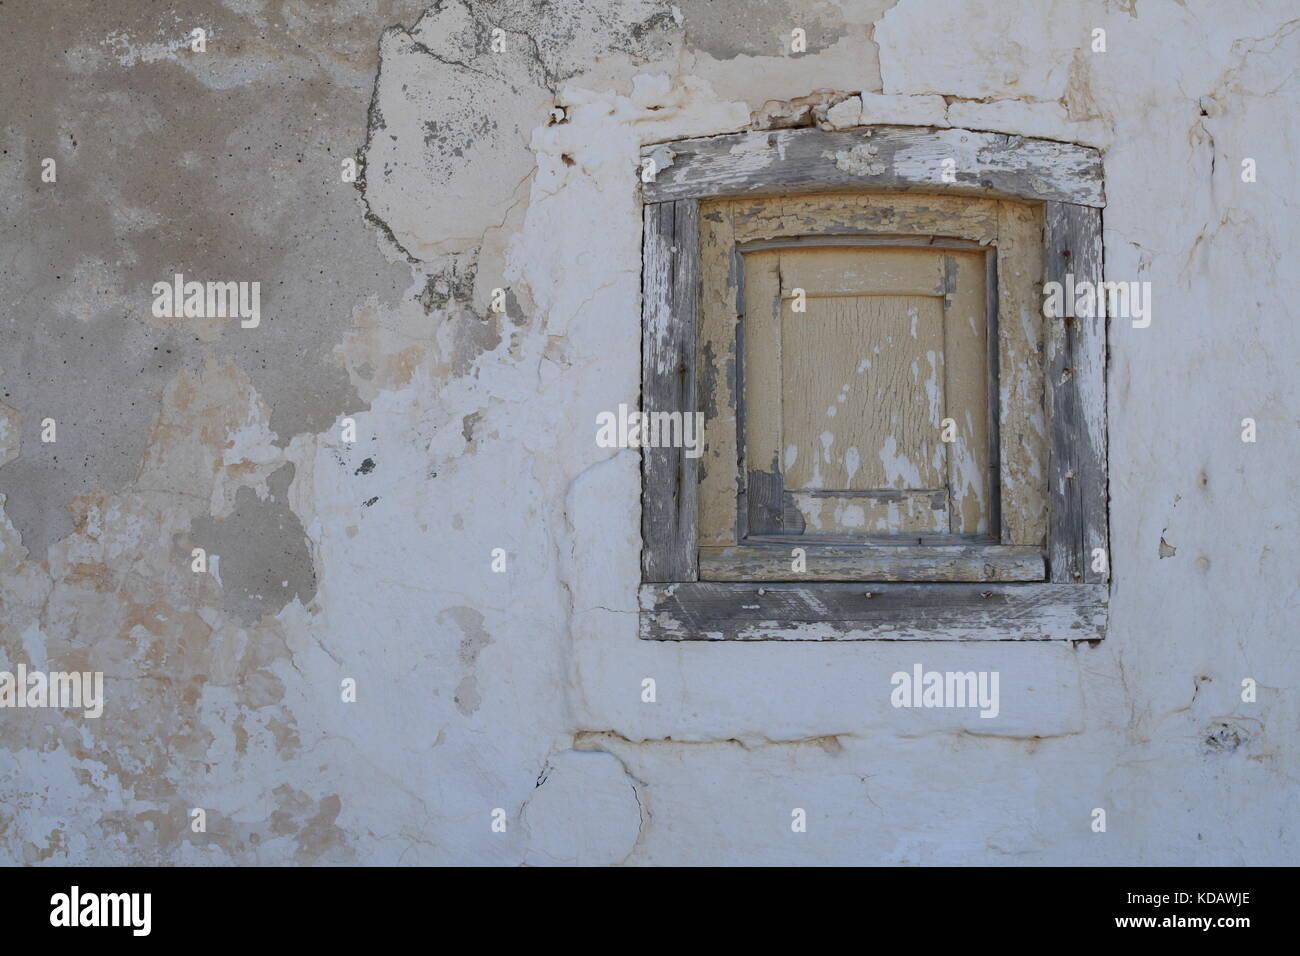 verwittertes geschlossenes Fenster an einer bröckelnden Haus Fasade - weathered closed window on a crumbling - Stock Image